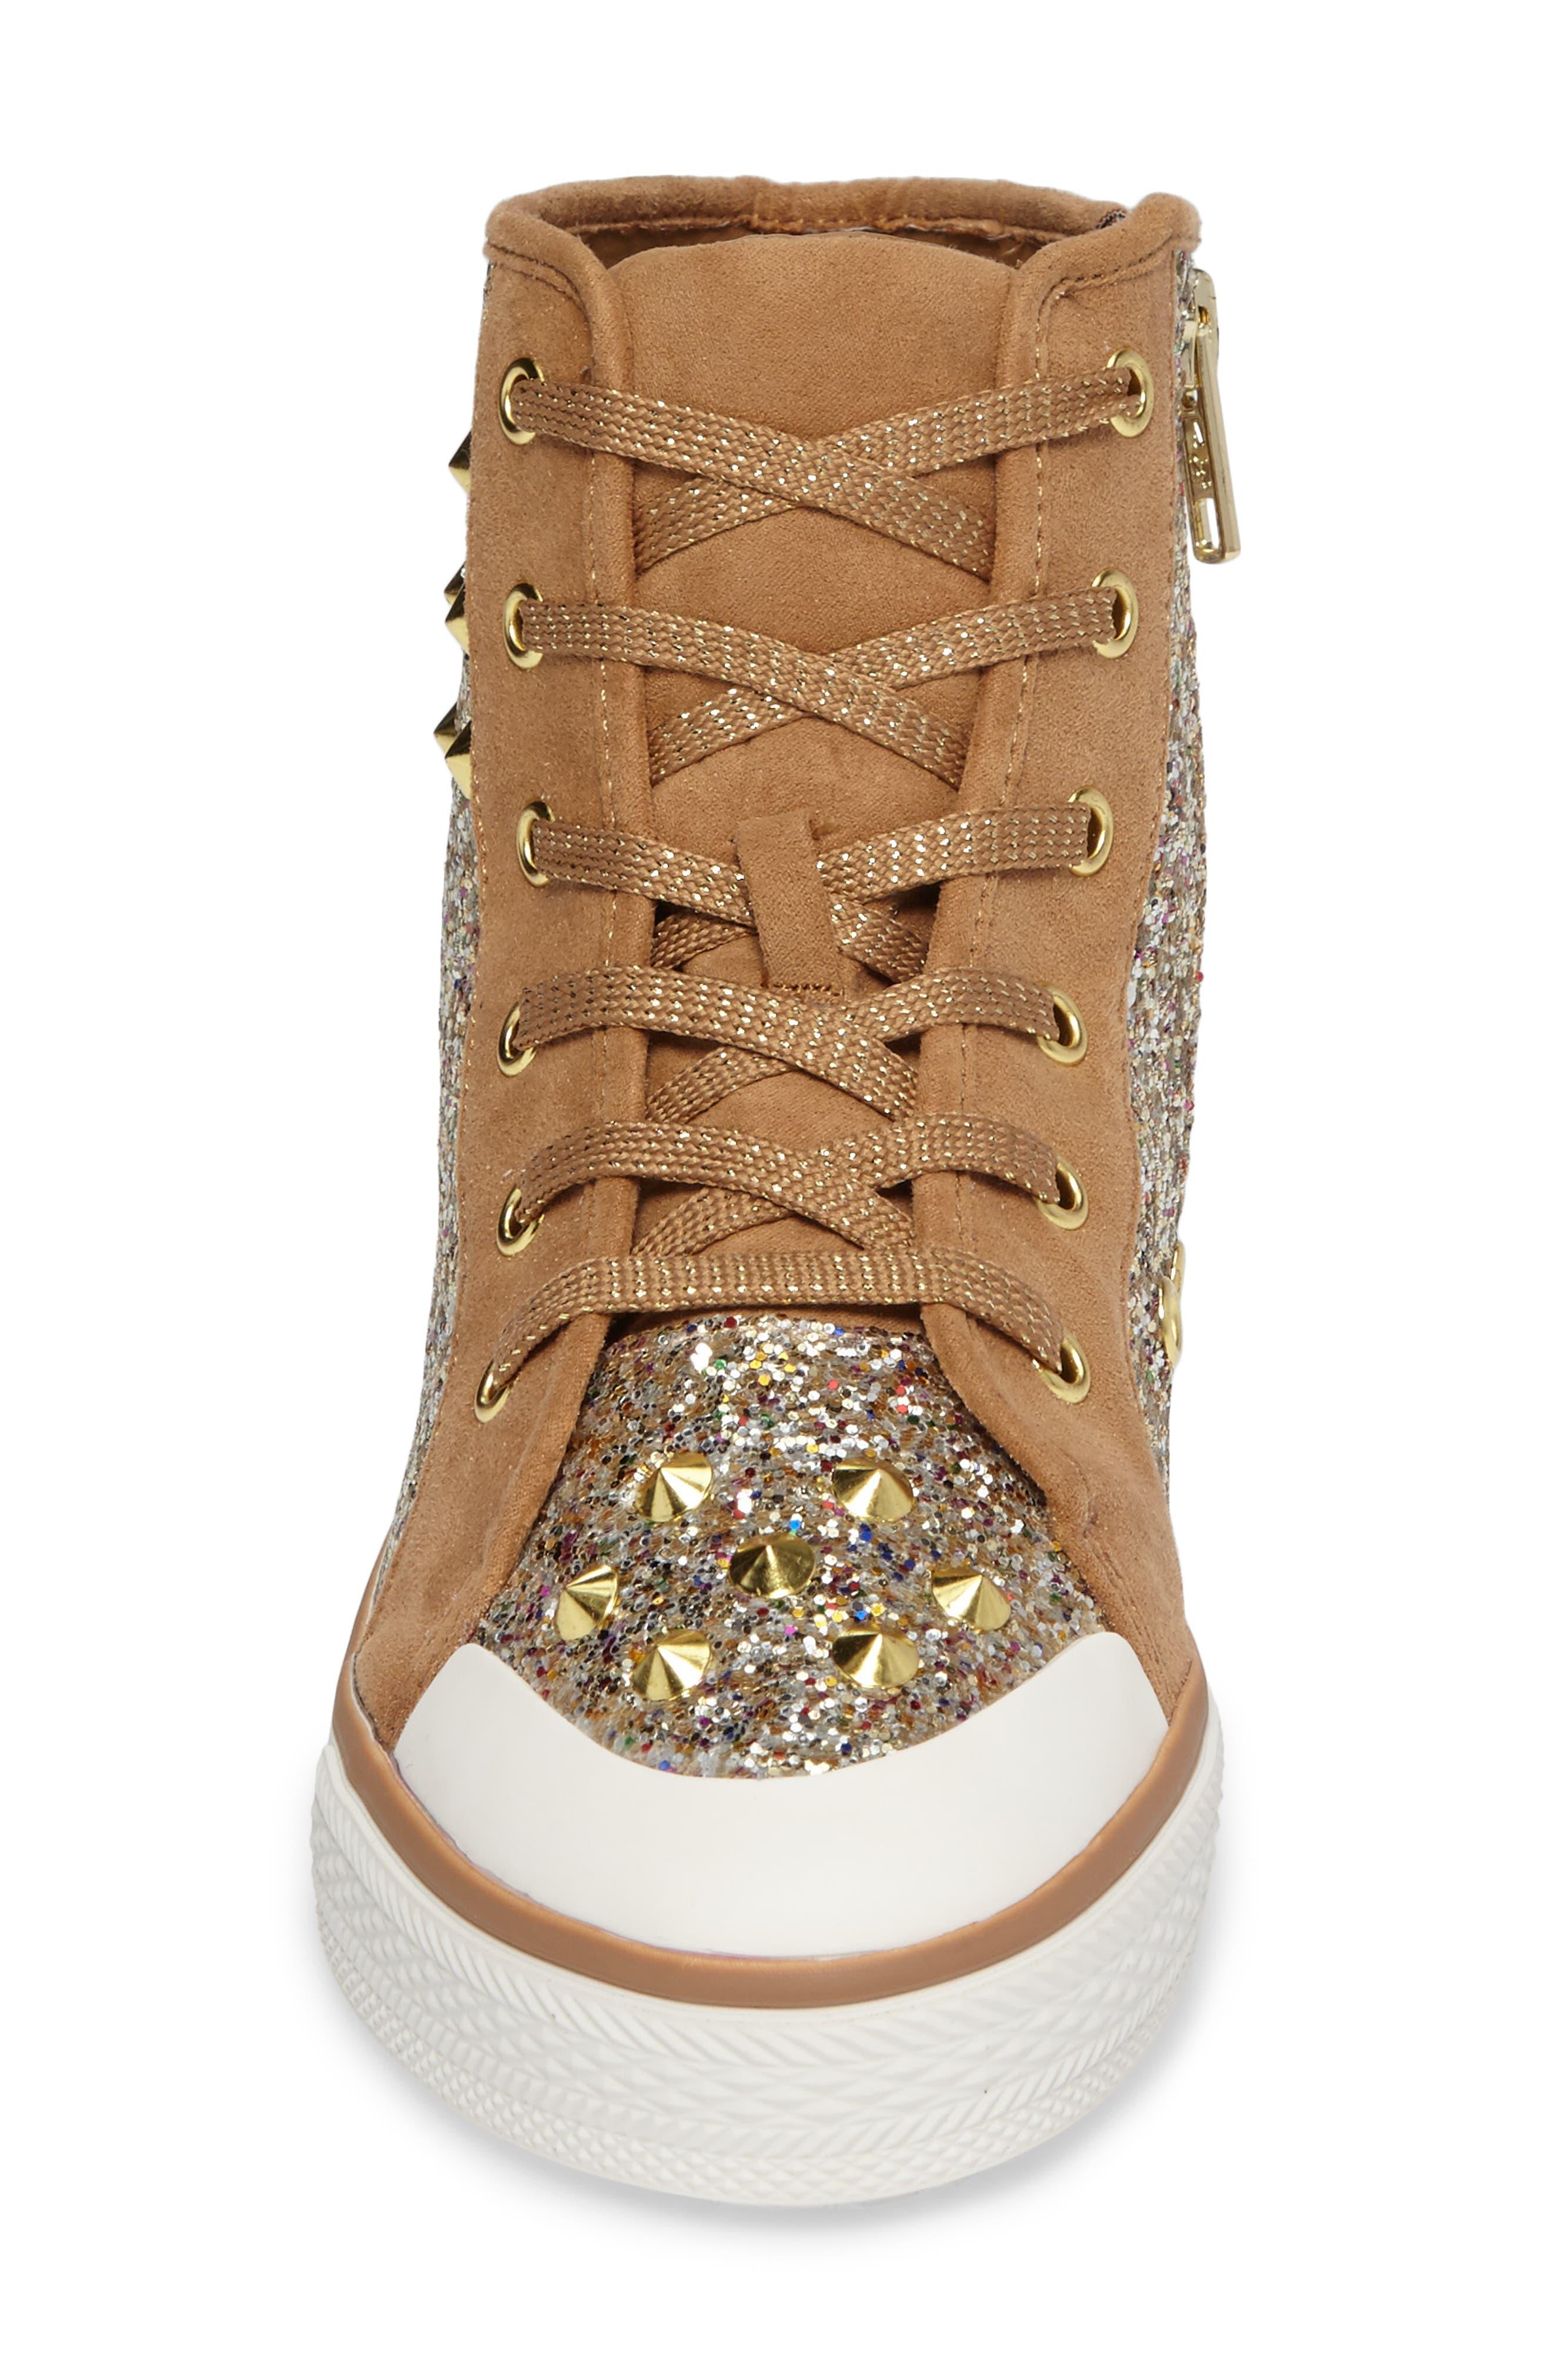 Alternate Image 4  - Ash Lita Roe Glittery High Top Sneaker (Toddler, Little Kid & Big Kid)